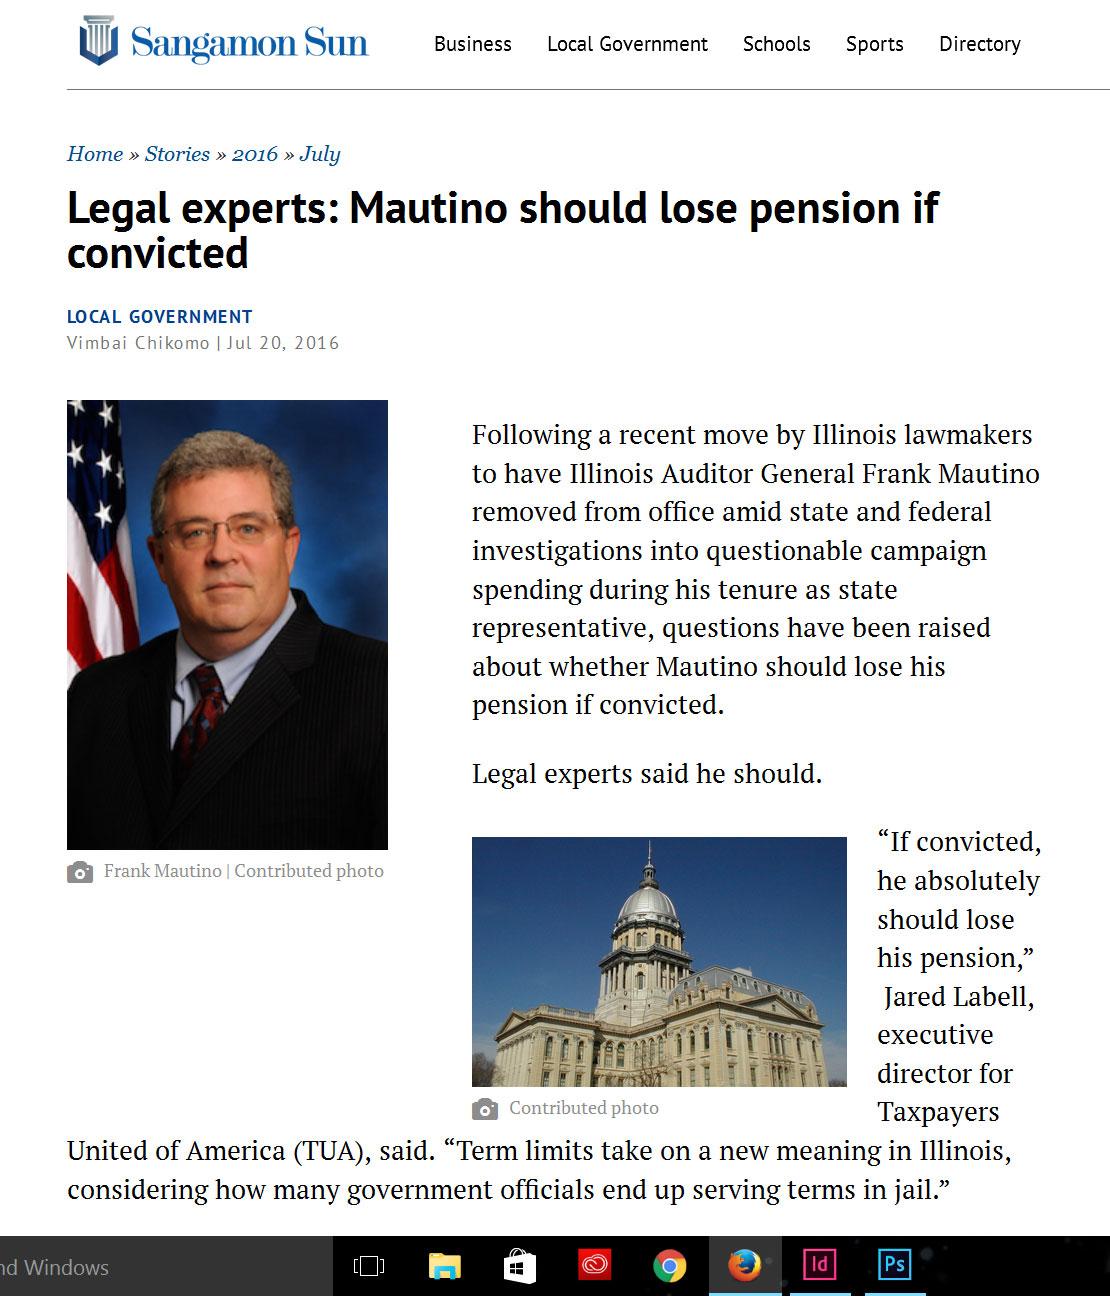 Sangamon Sun Legal experts: Mautino should lose pension if convicted